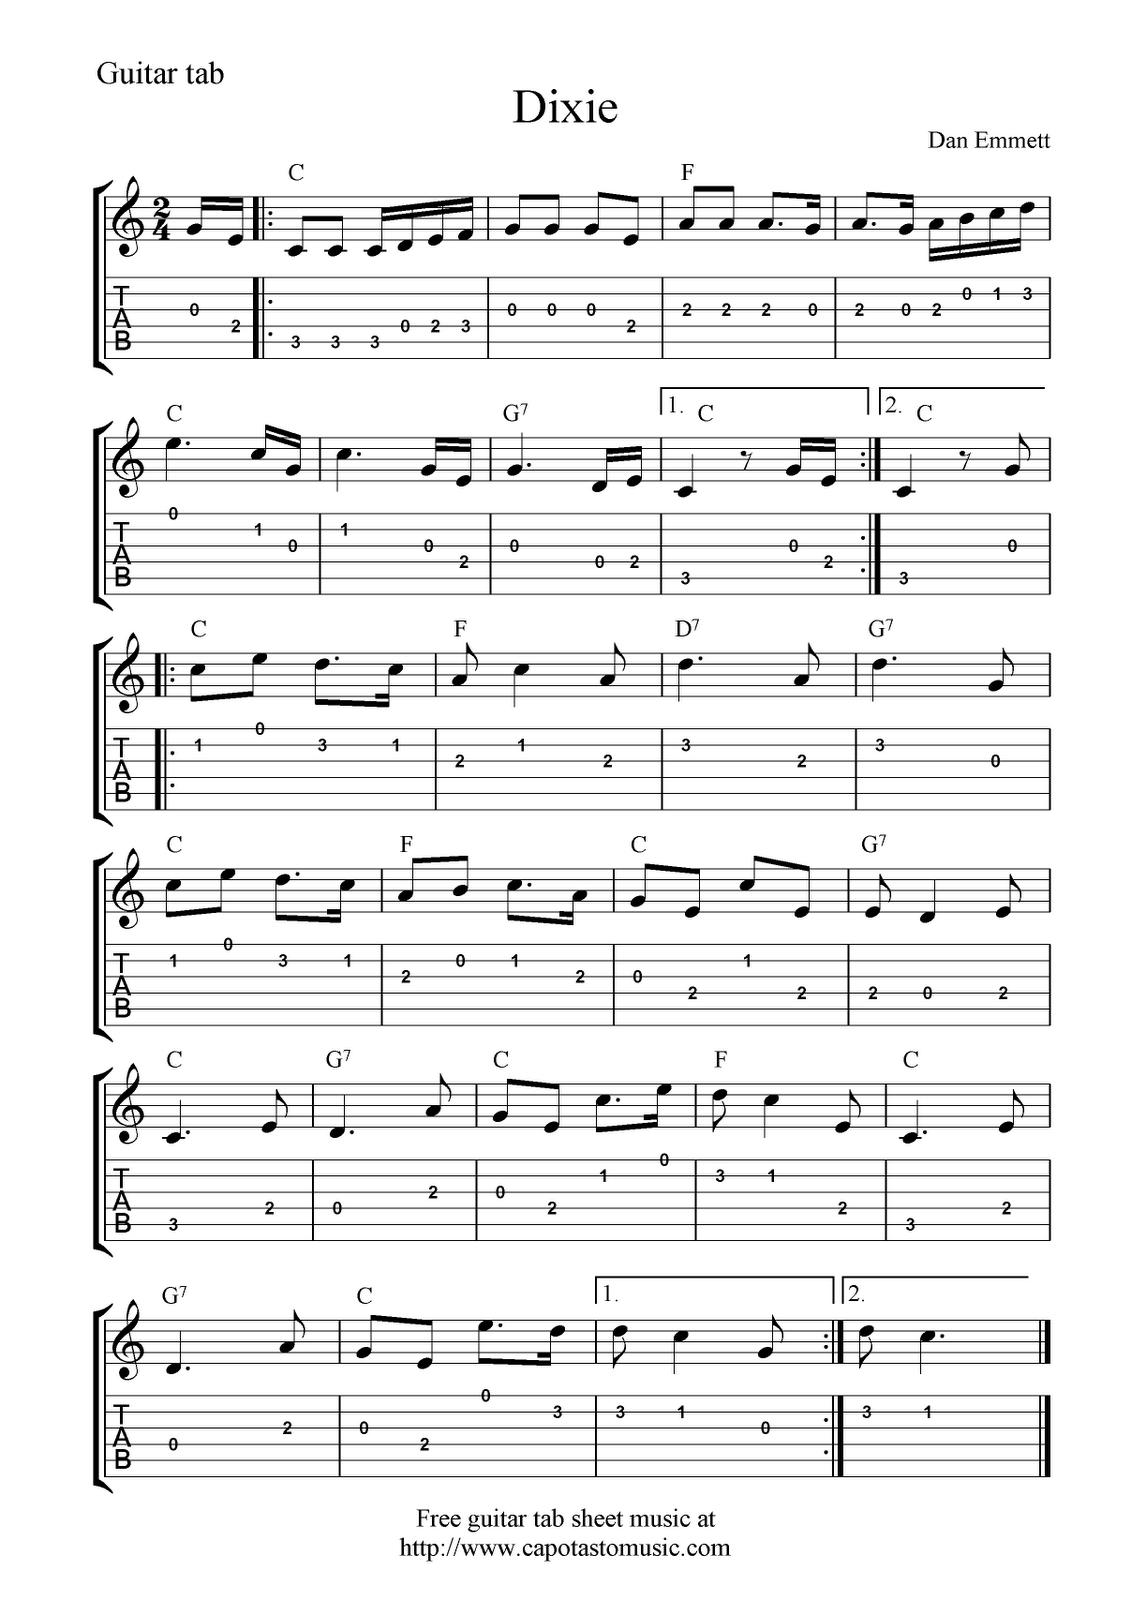 Guitar Music Sheets For Beginners   Free Guitar Tab Sheet Music - Free Guitar Sheet Music For Popular Songs Printable